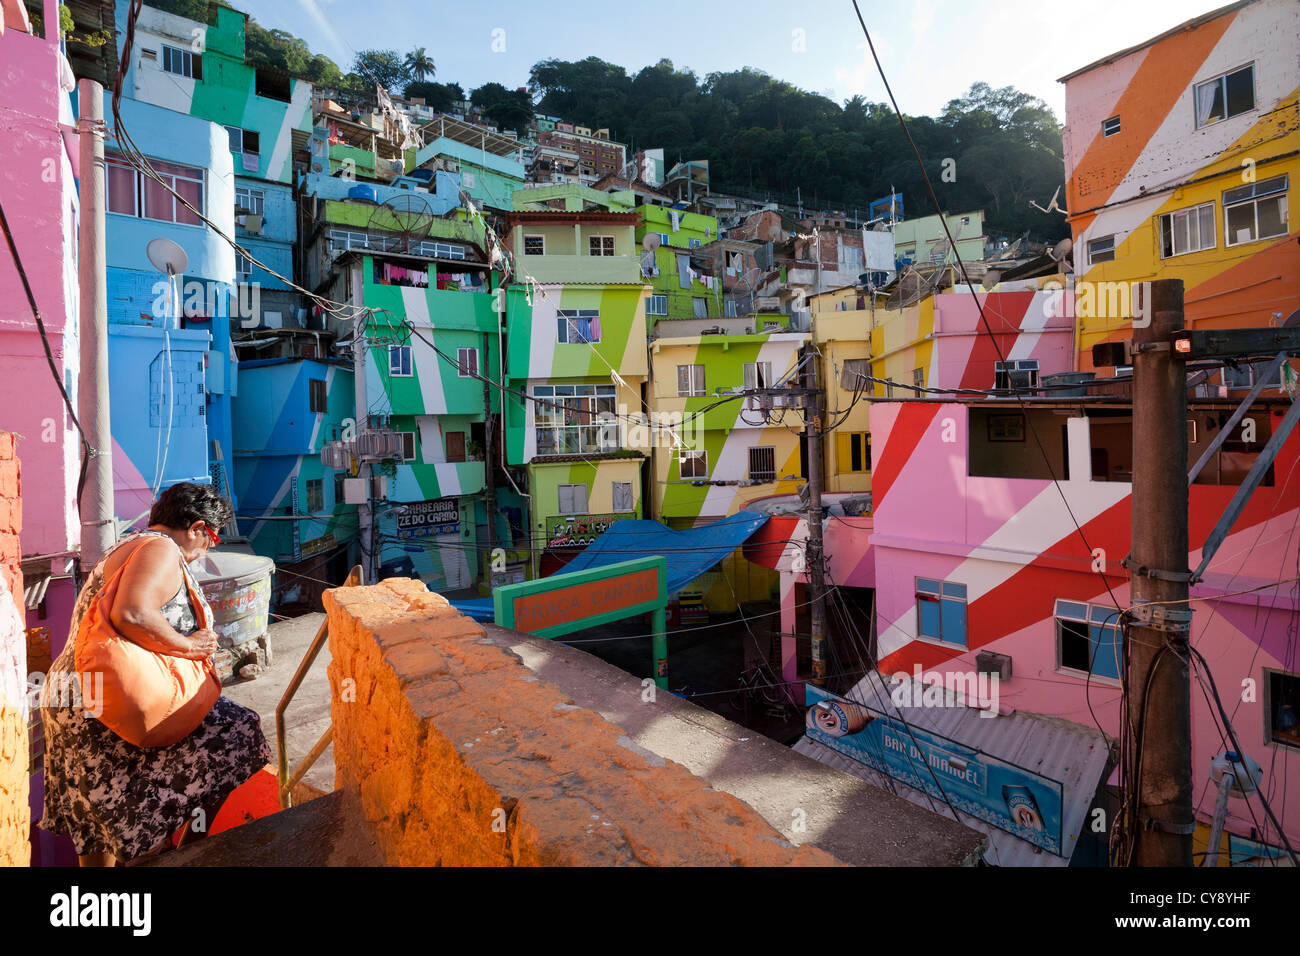 Brazilian Houses Rio De Janeiro Brazil Conflict Between Brazilian Army X Drug